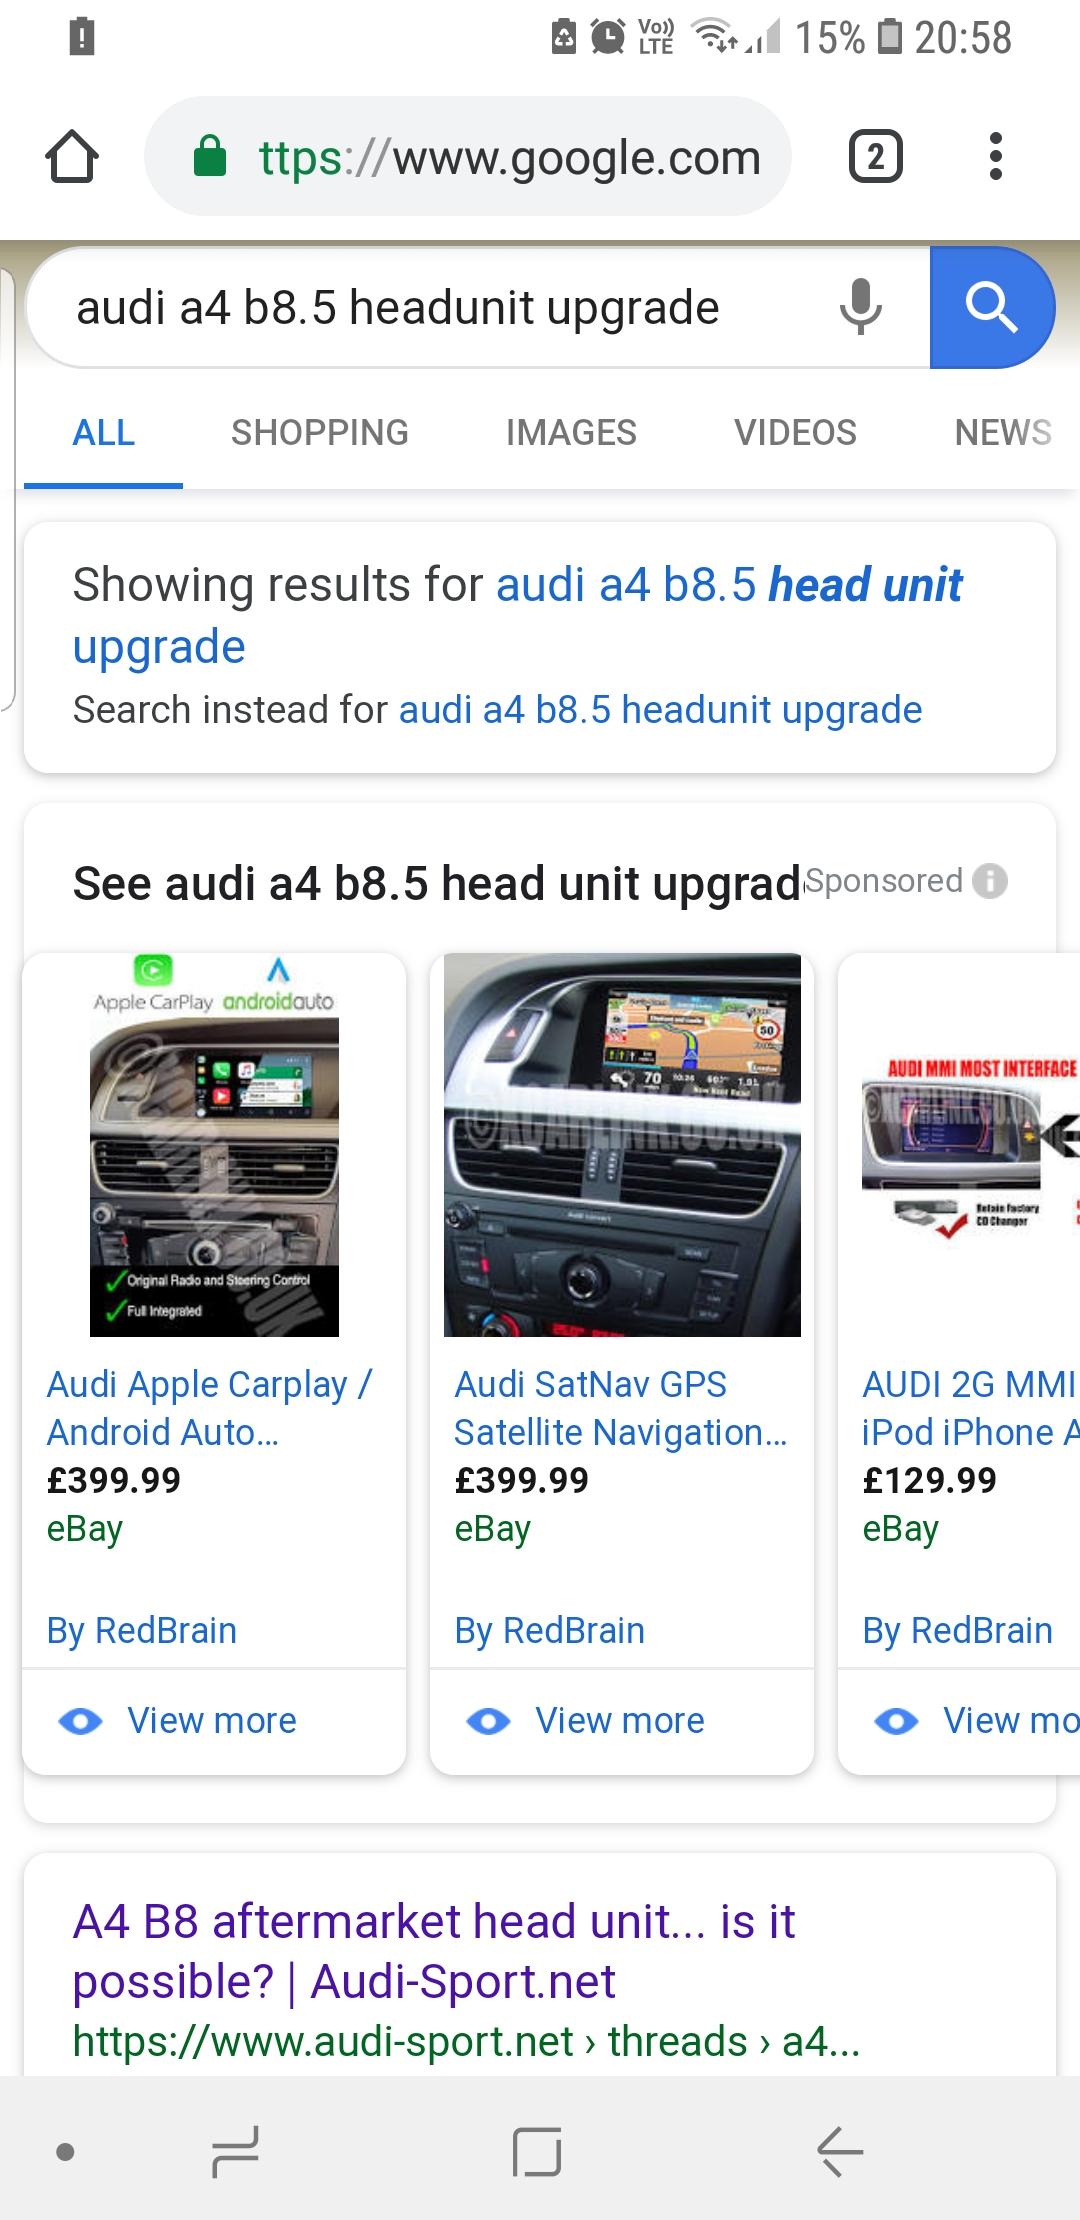 Headunit upgrades | Audi-Sport net